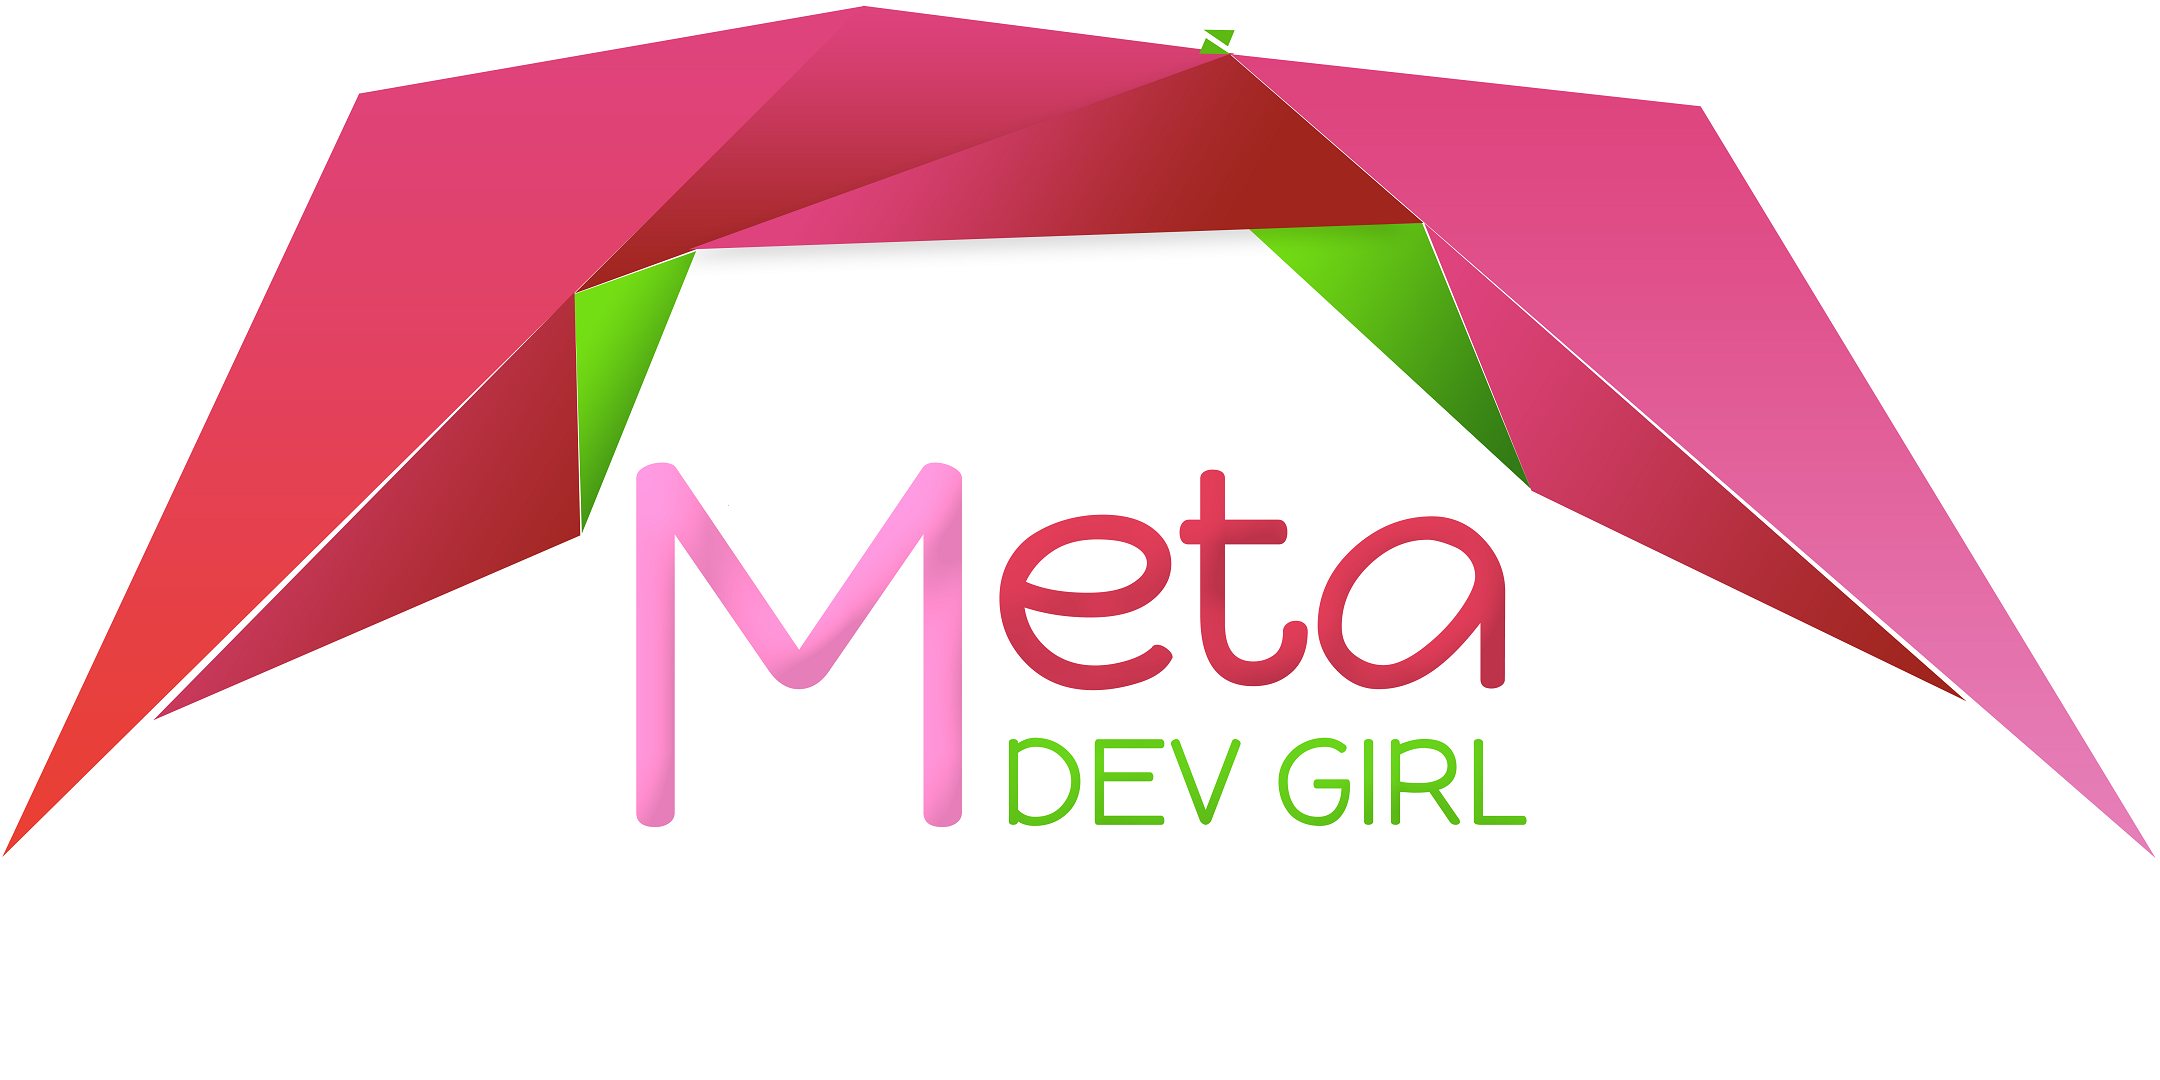 MetaDevGirl